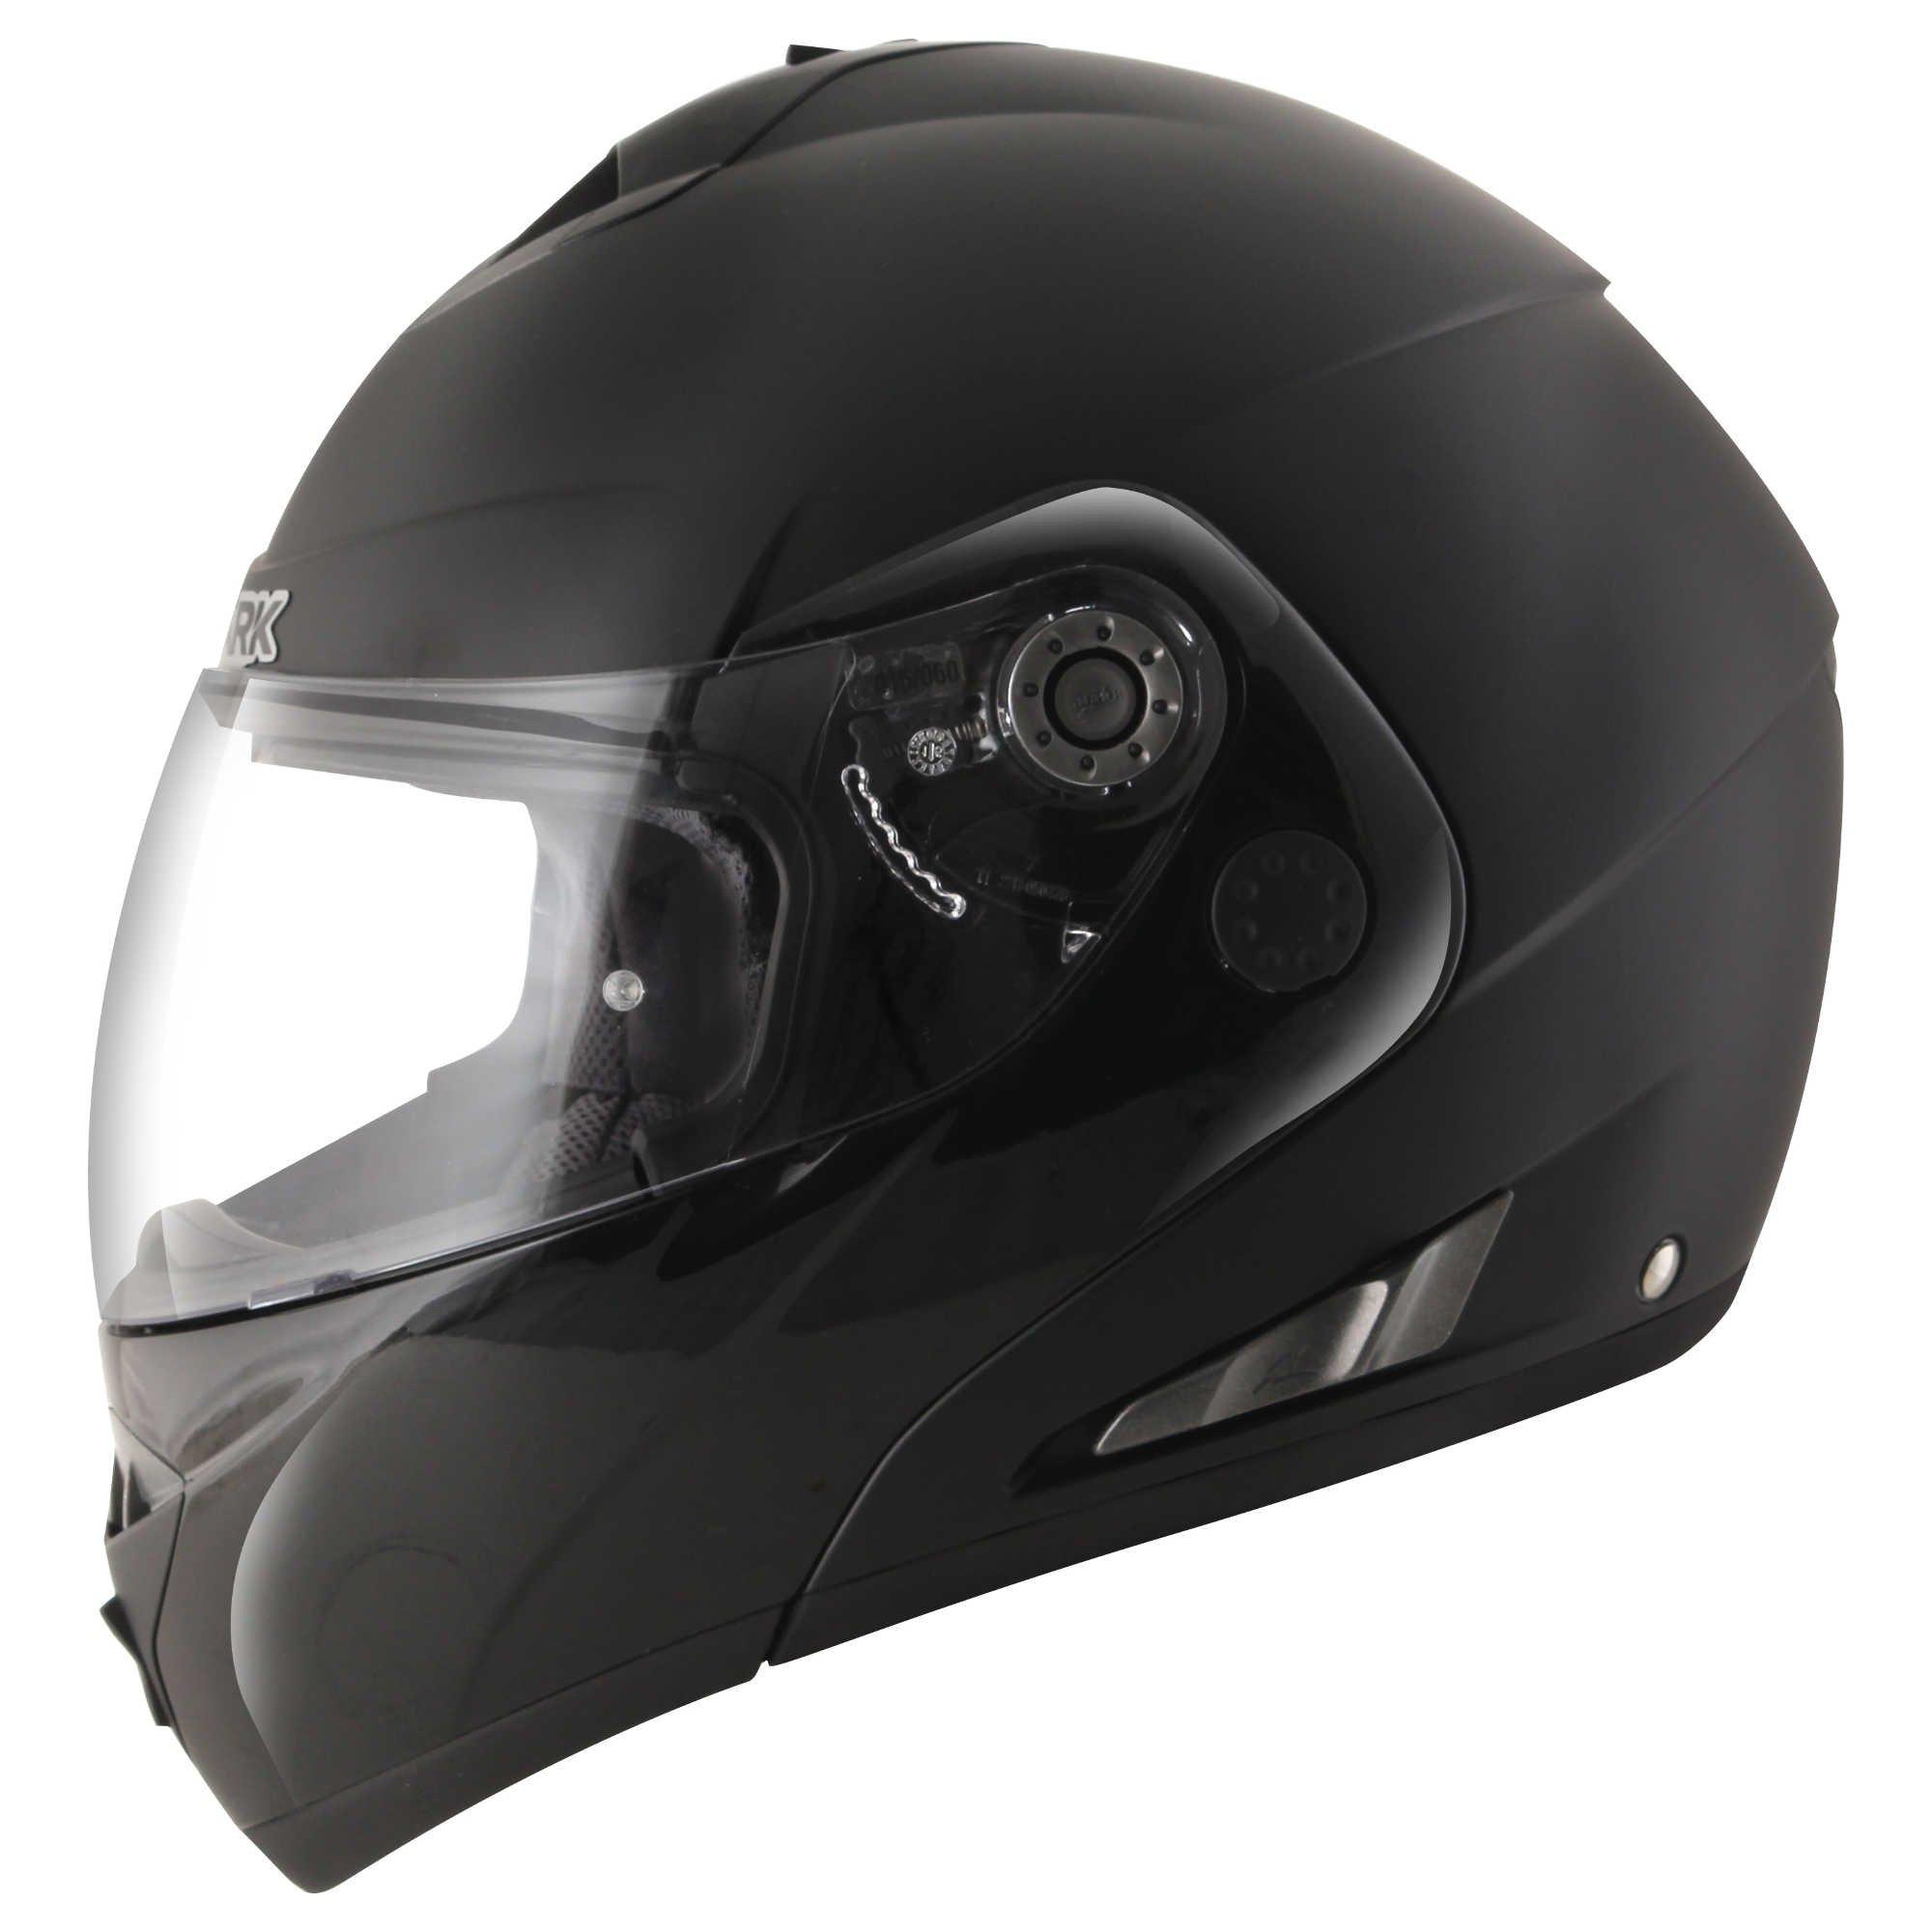 HE9665EBLKM - Shark OpenLine Pinlock Dual Black Flip Front Motorcycle Helmet M Matt Black (BLK)